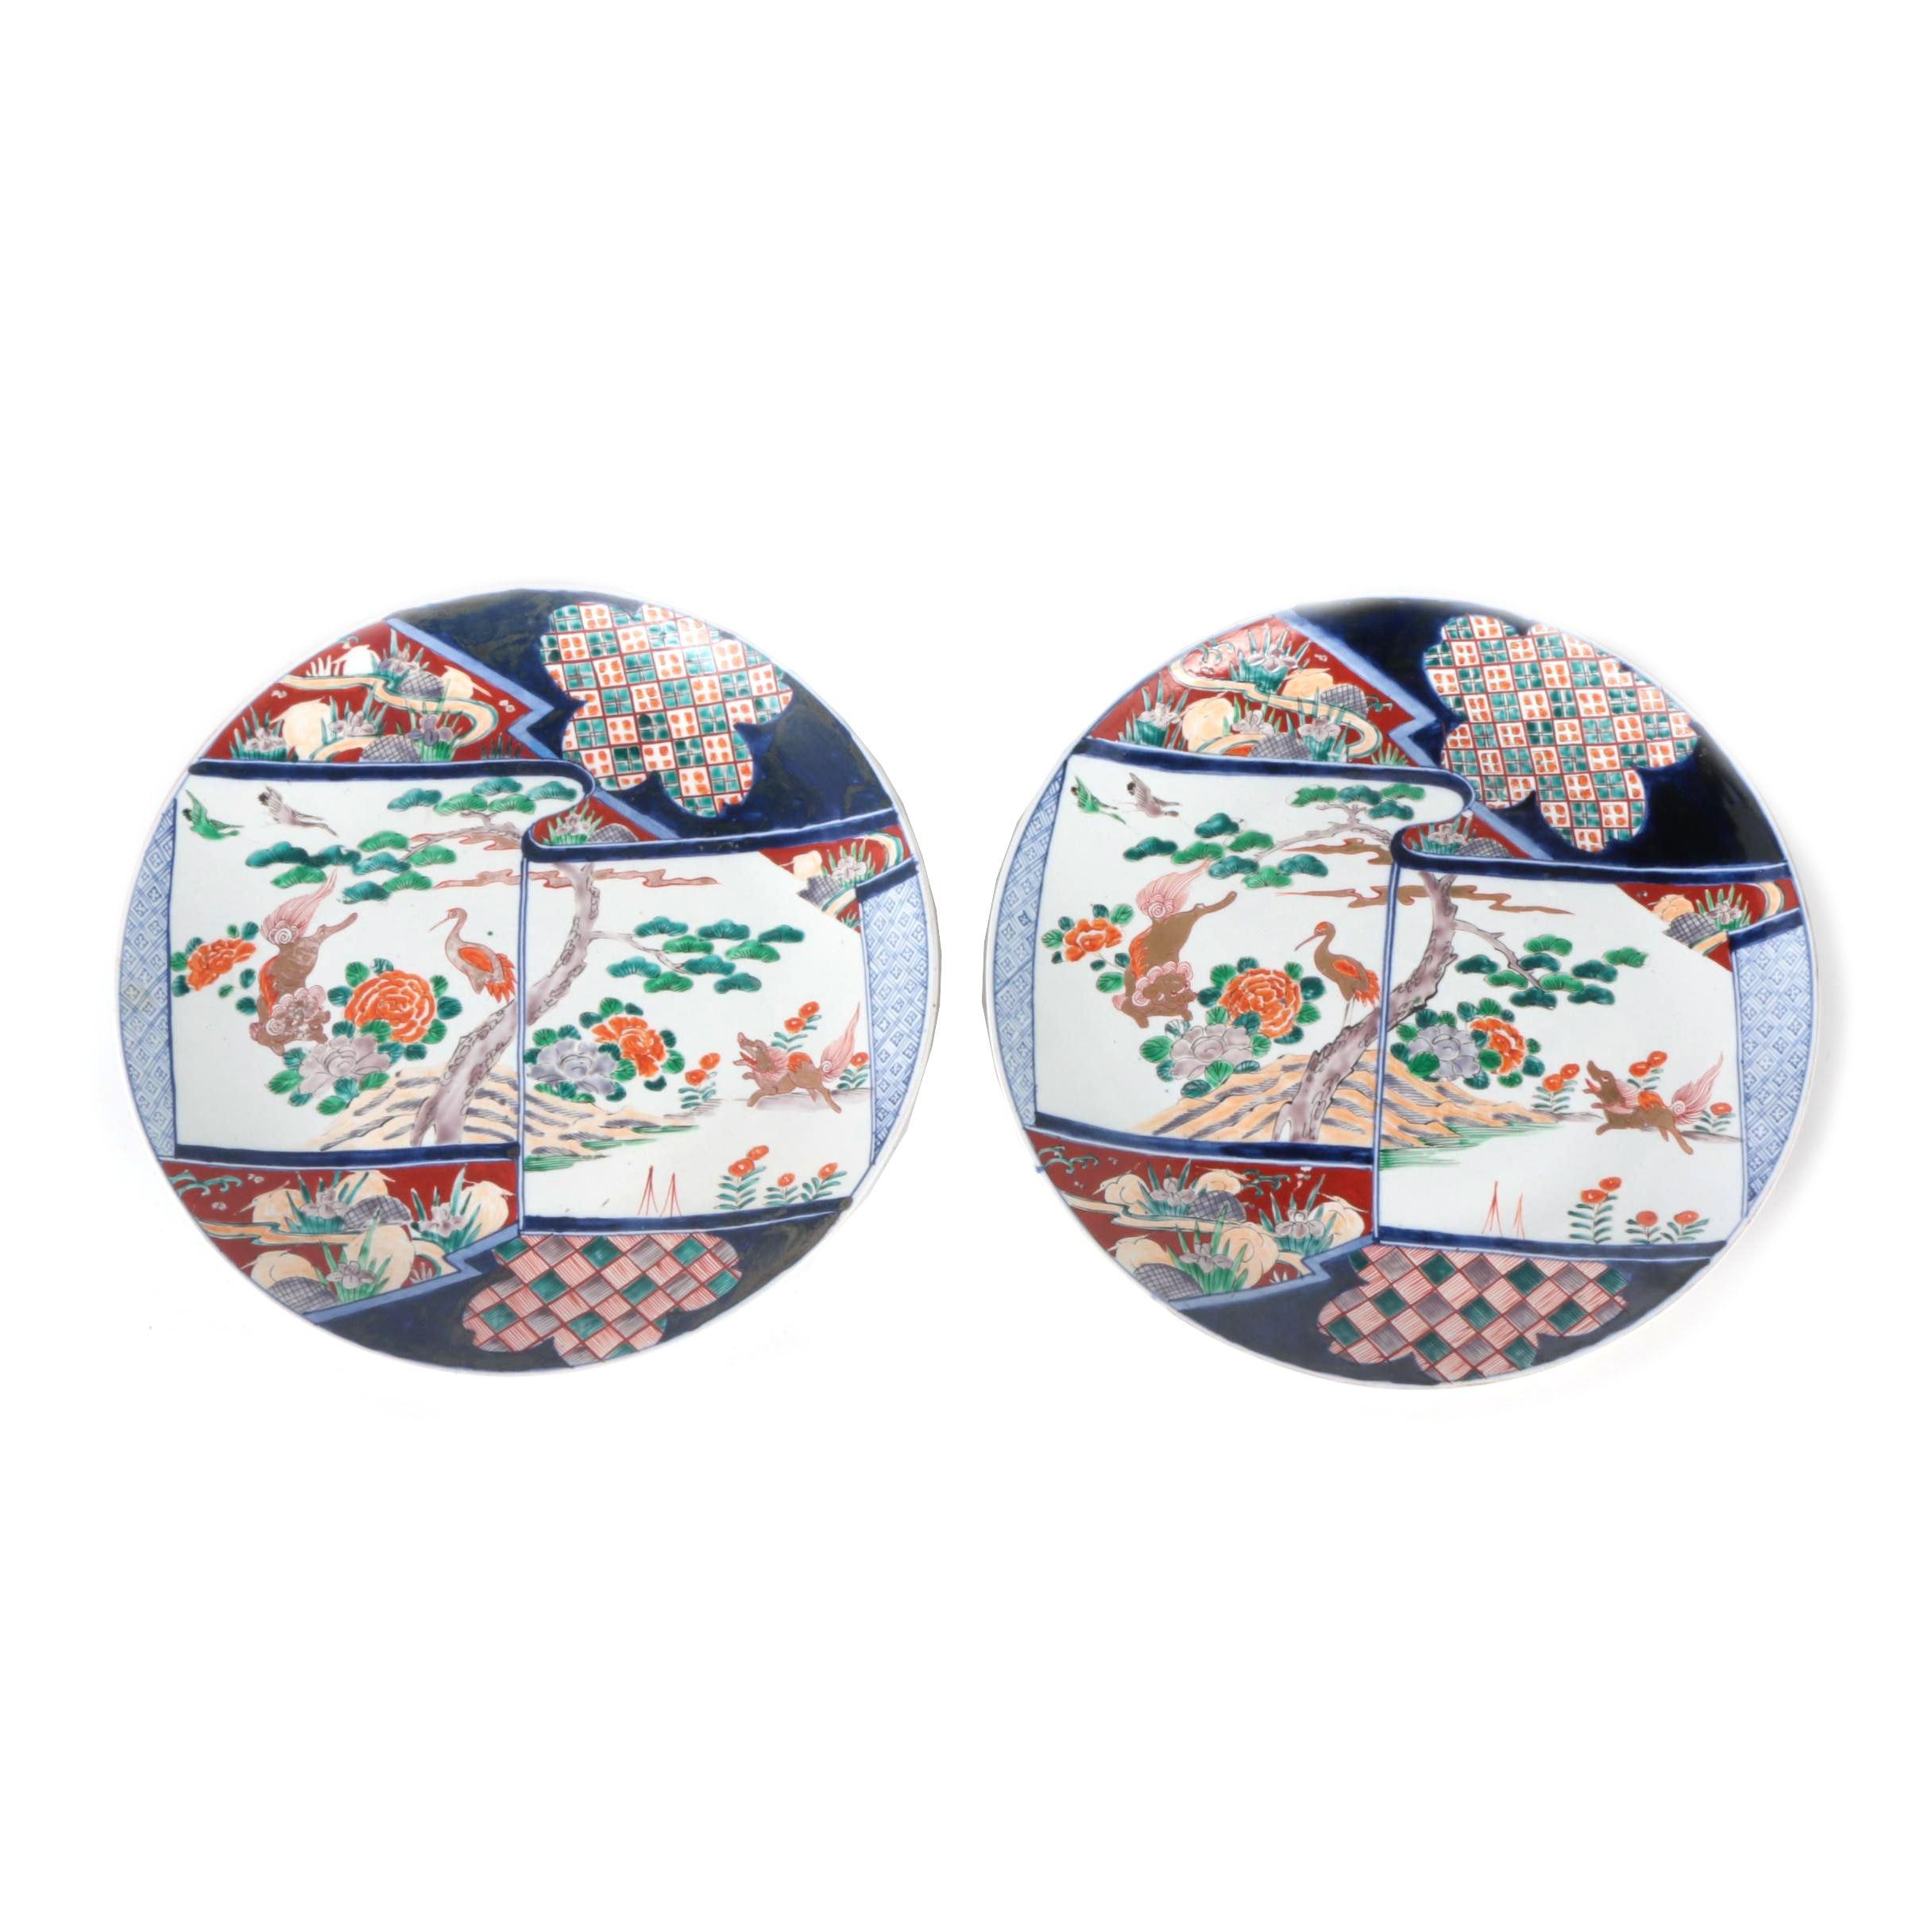 19th Century Japanese Imari Plates